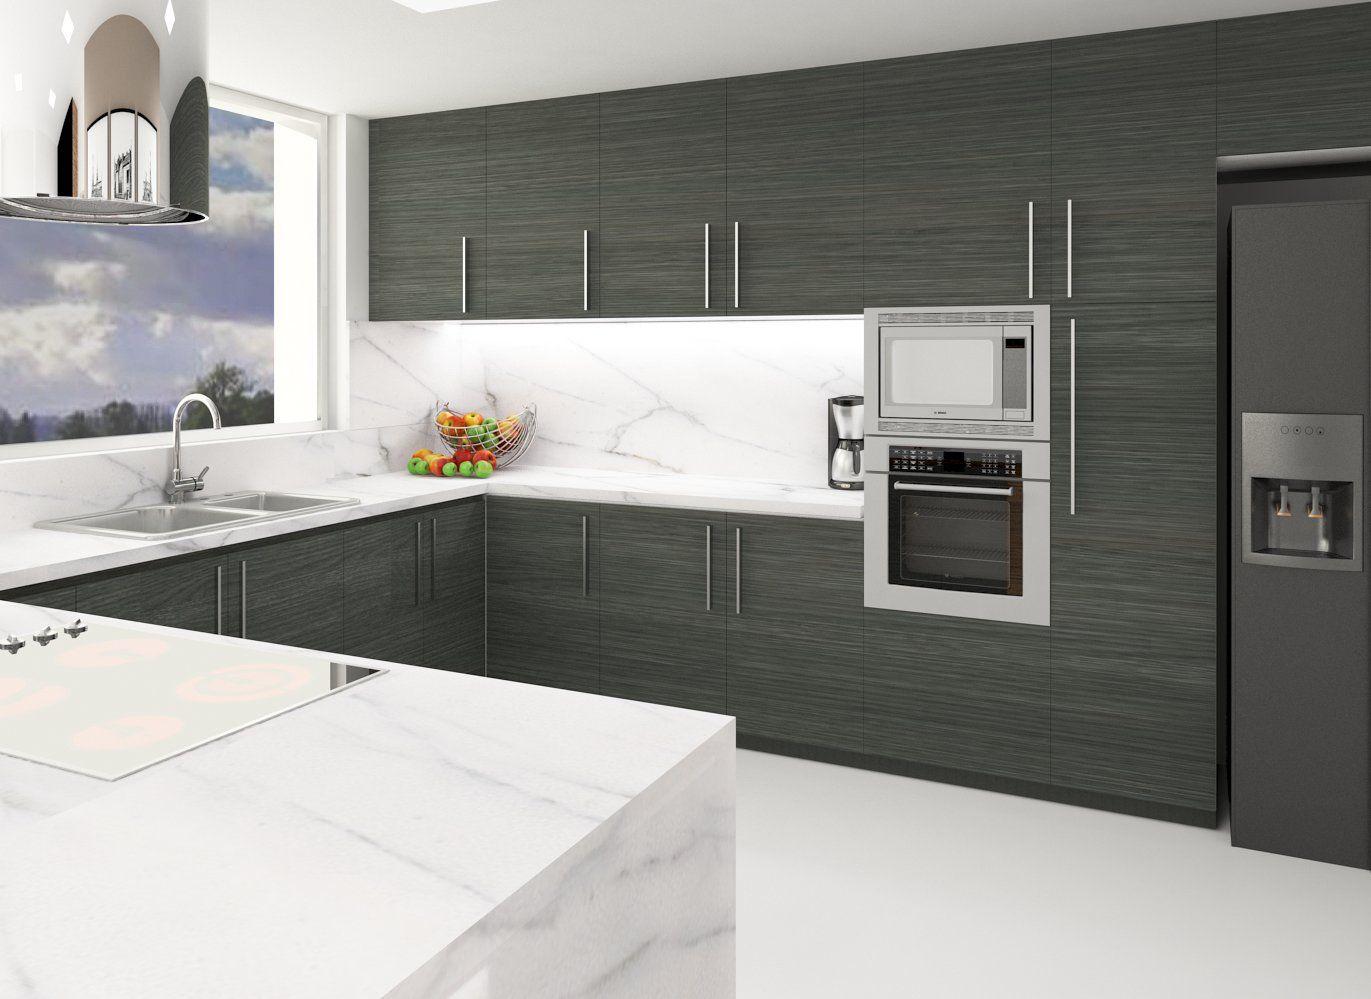 Diseño cocina moderno contemporaneo.   Diseño Interior   Pinterest ...